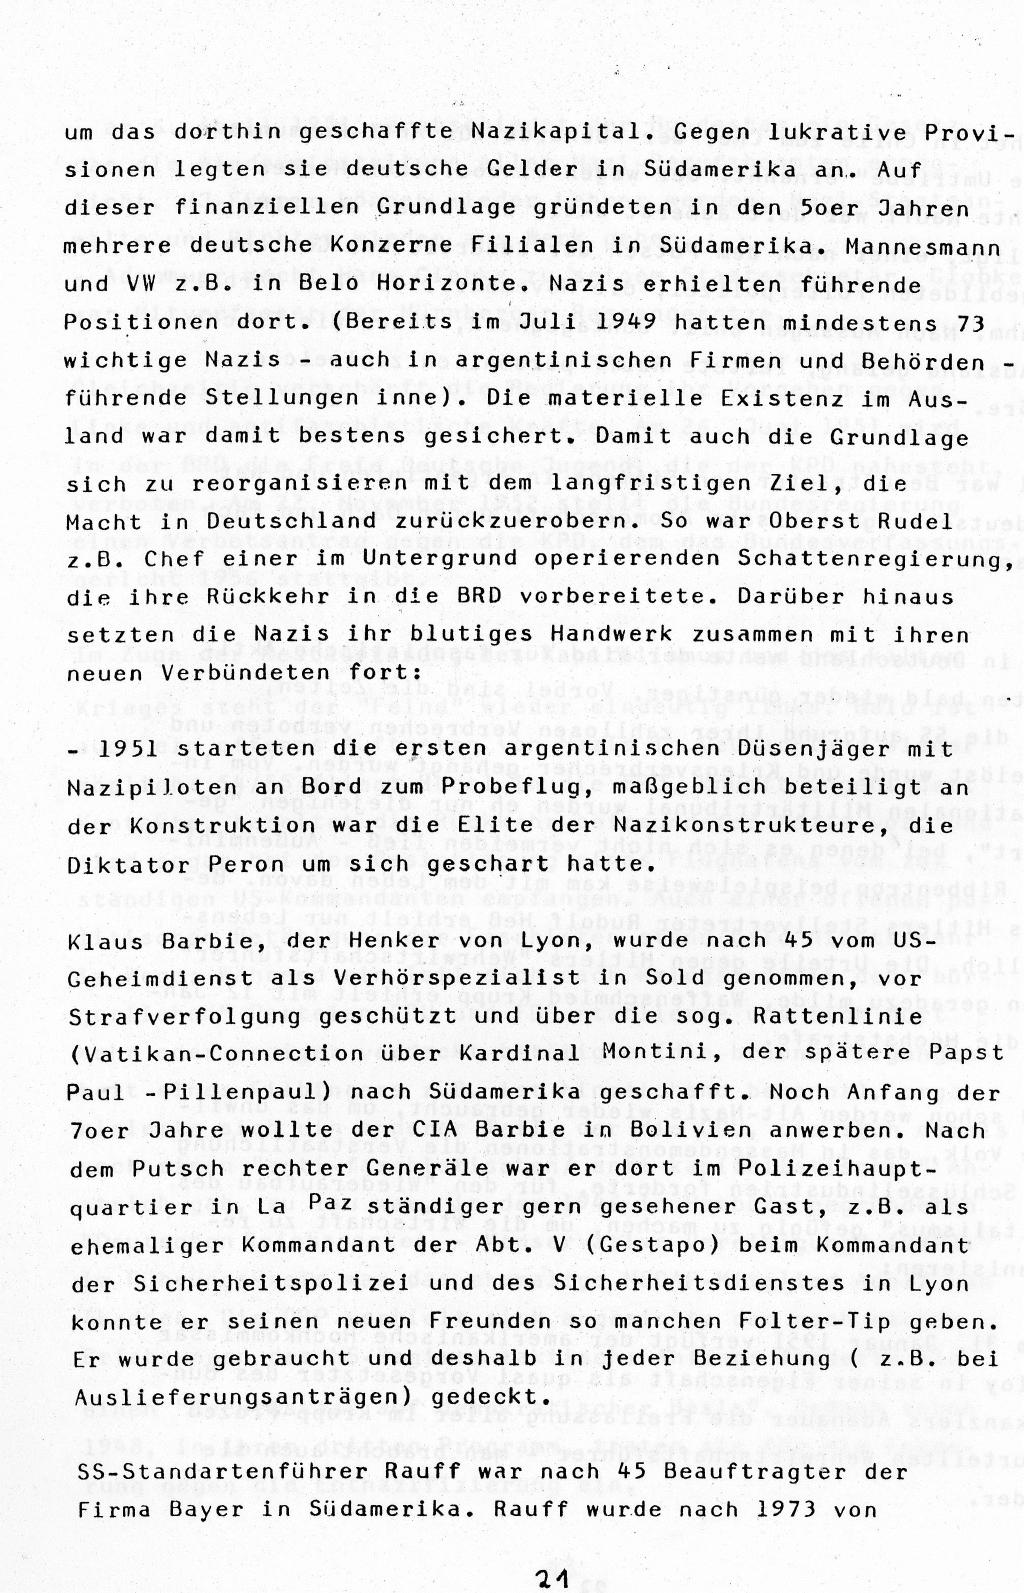 Berlin_1983_Autonome_Gruppen_Faschismus_im_Kapitalismus_21